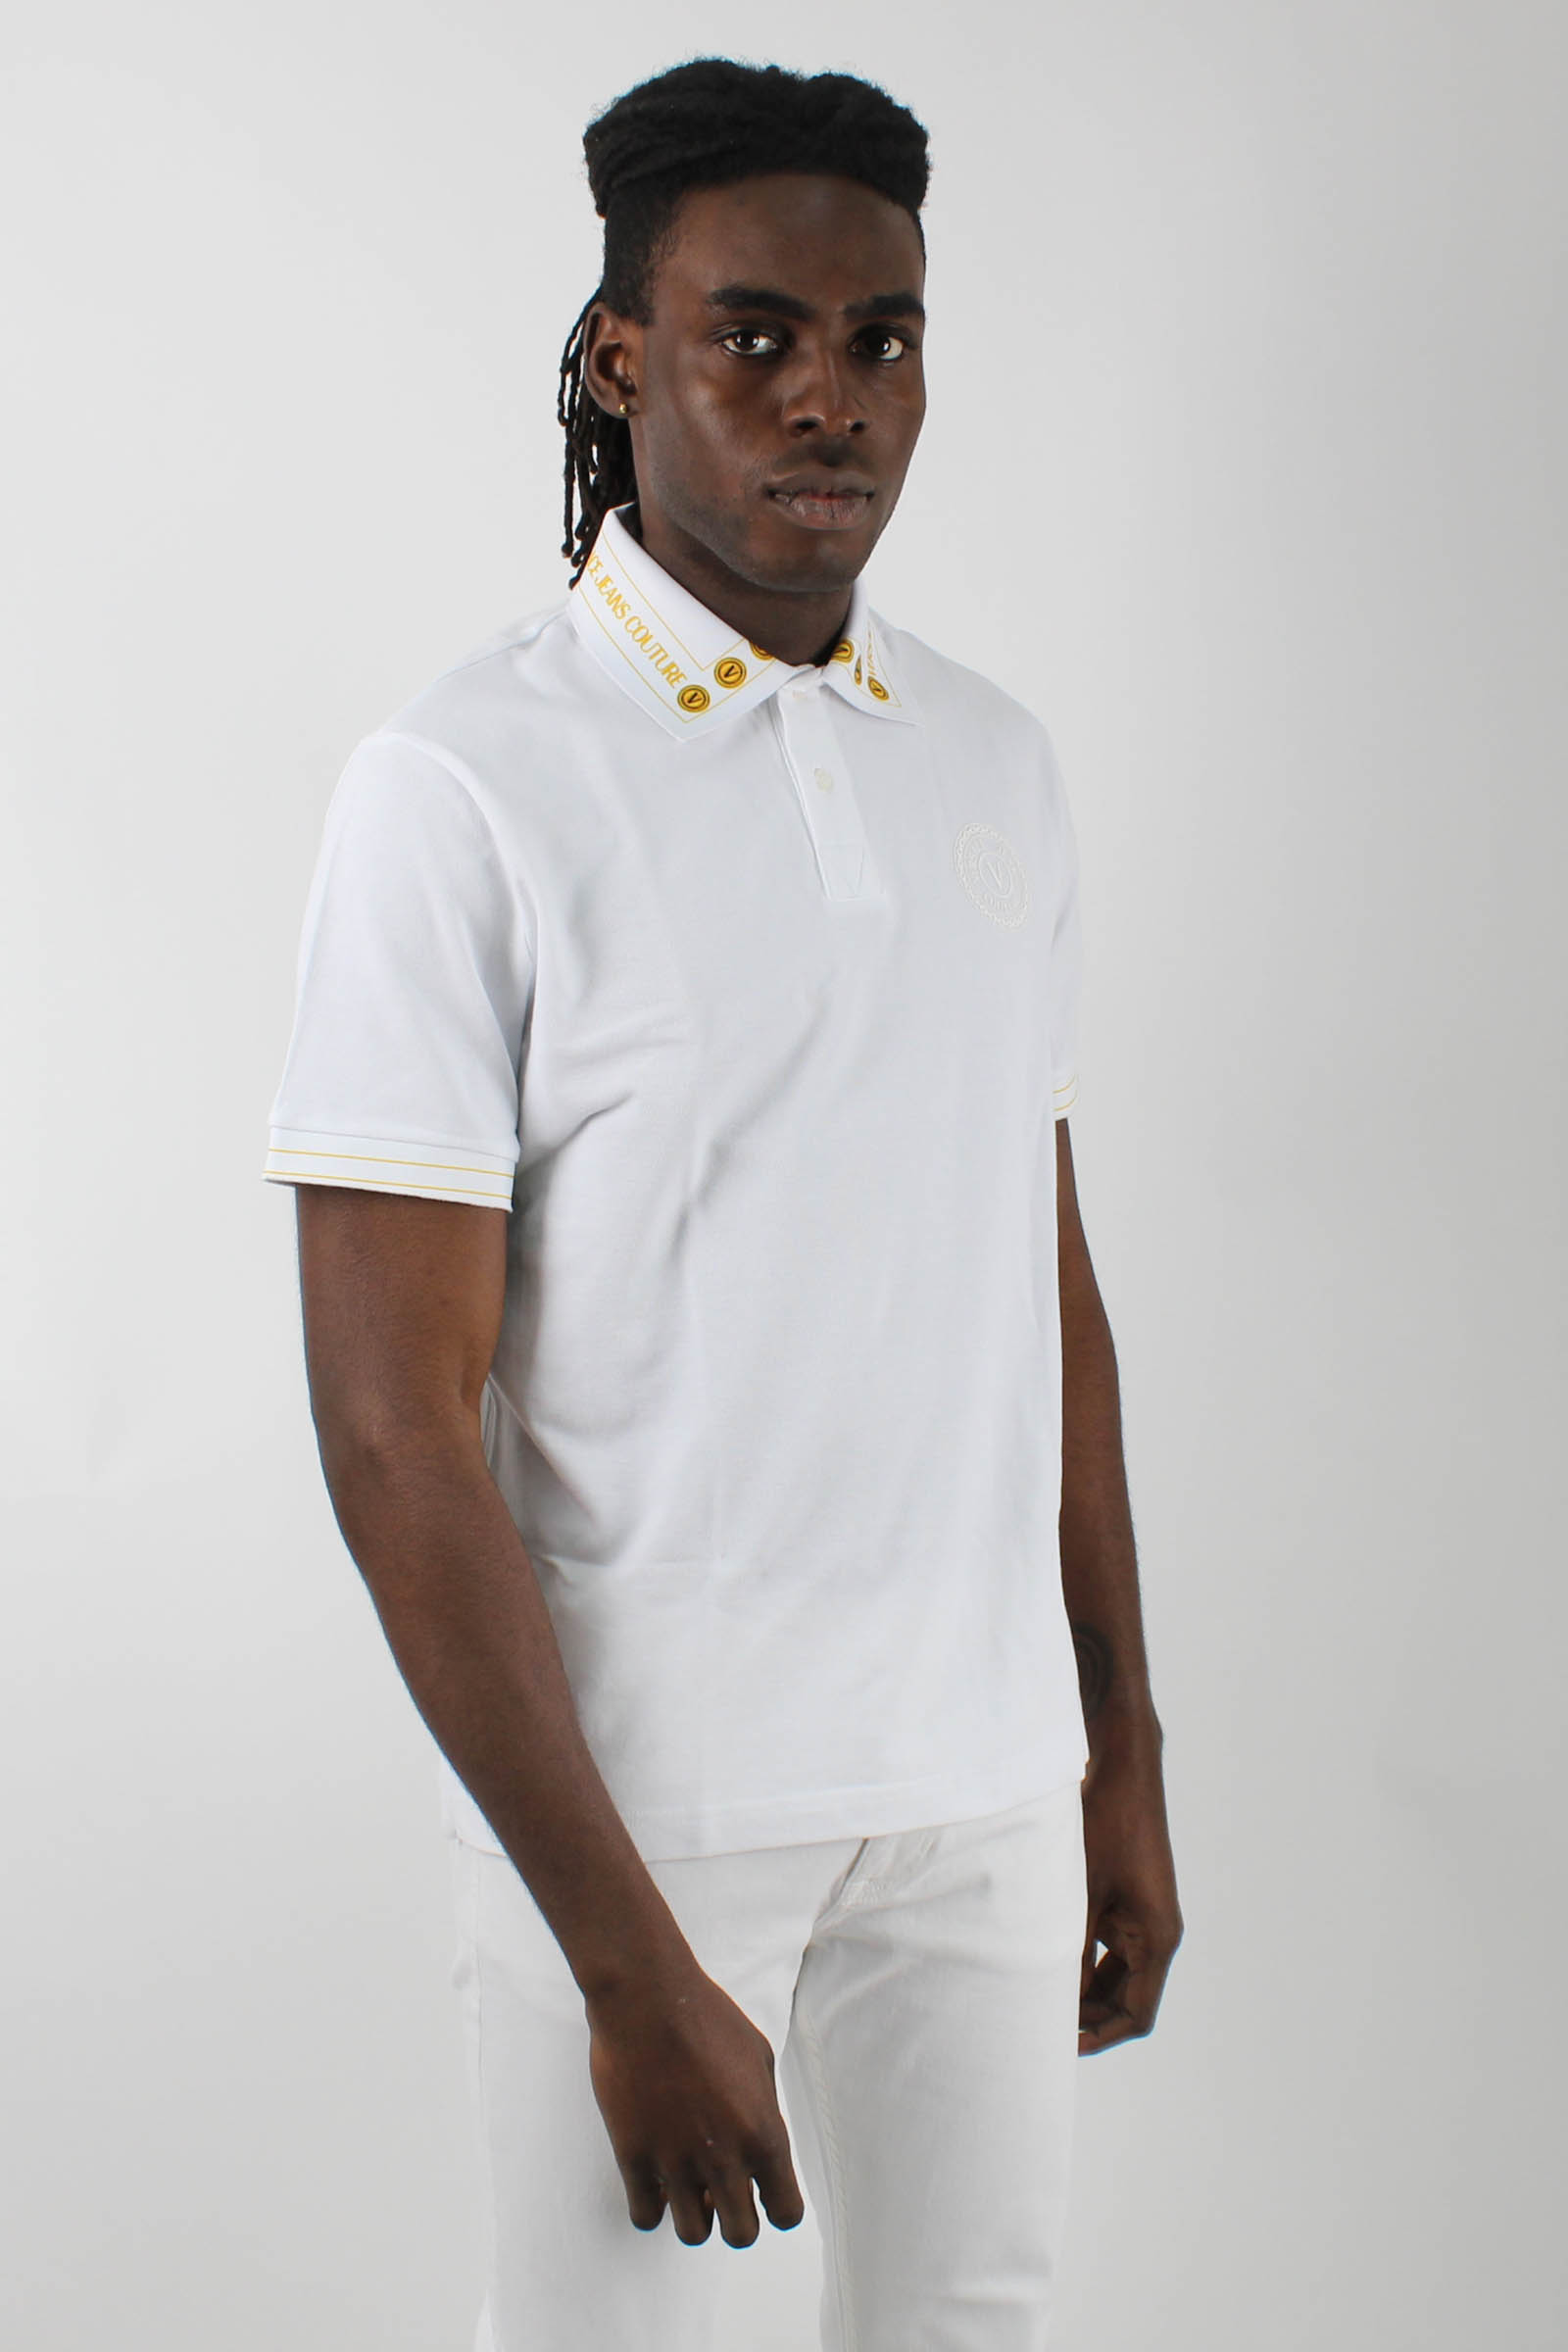 VERSACE JEANS | Shirt2 | B3 GWA7T6 36571K41